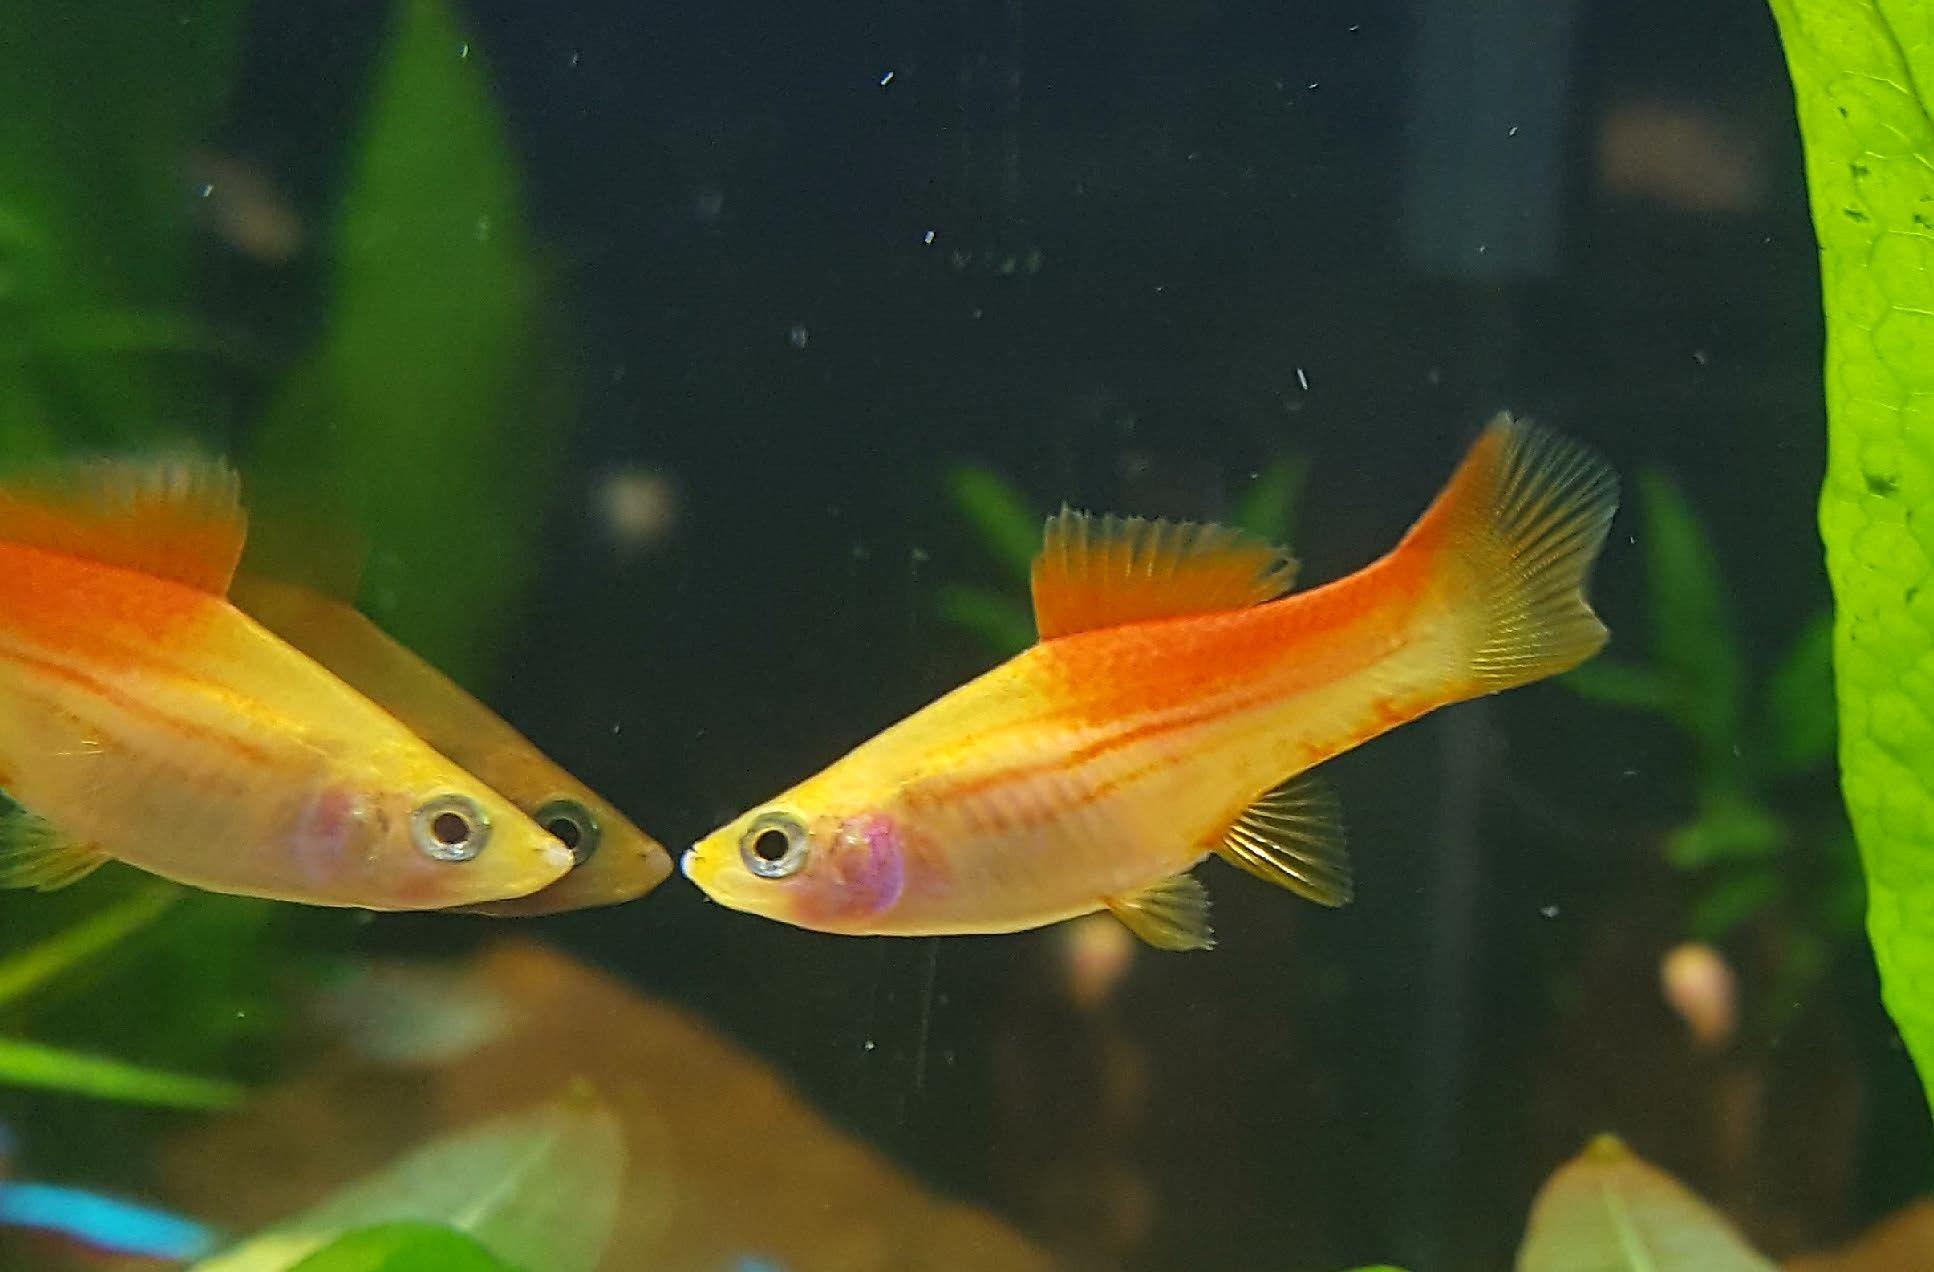 Female Pineapple Swordtail Fish animals